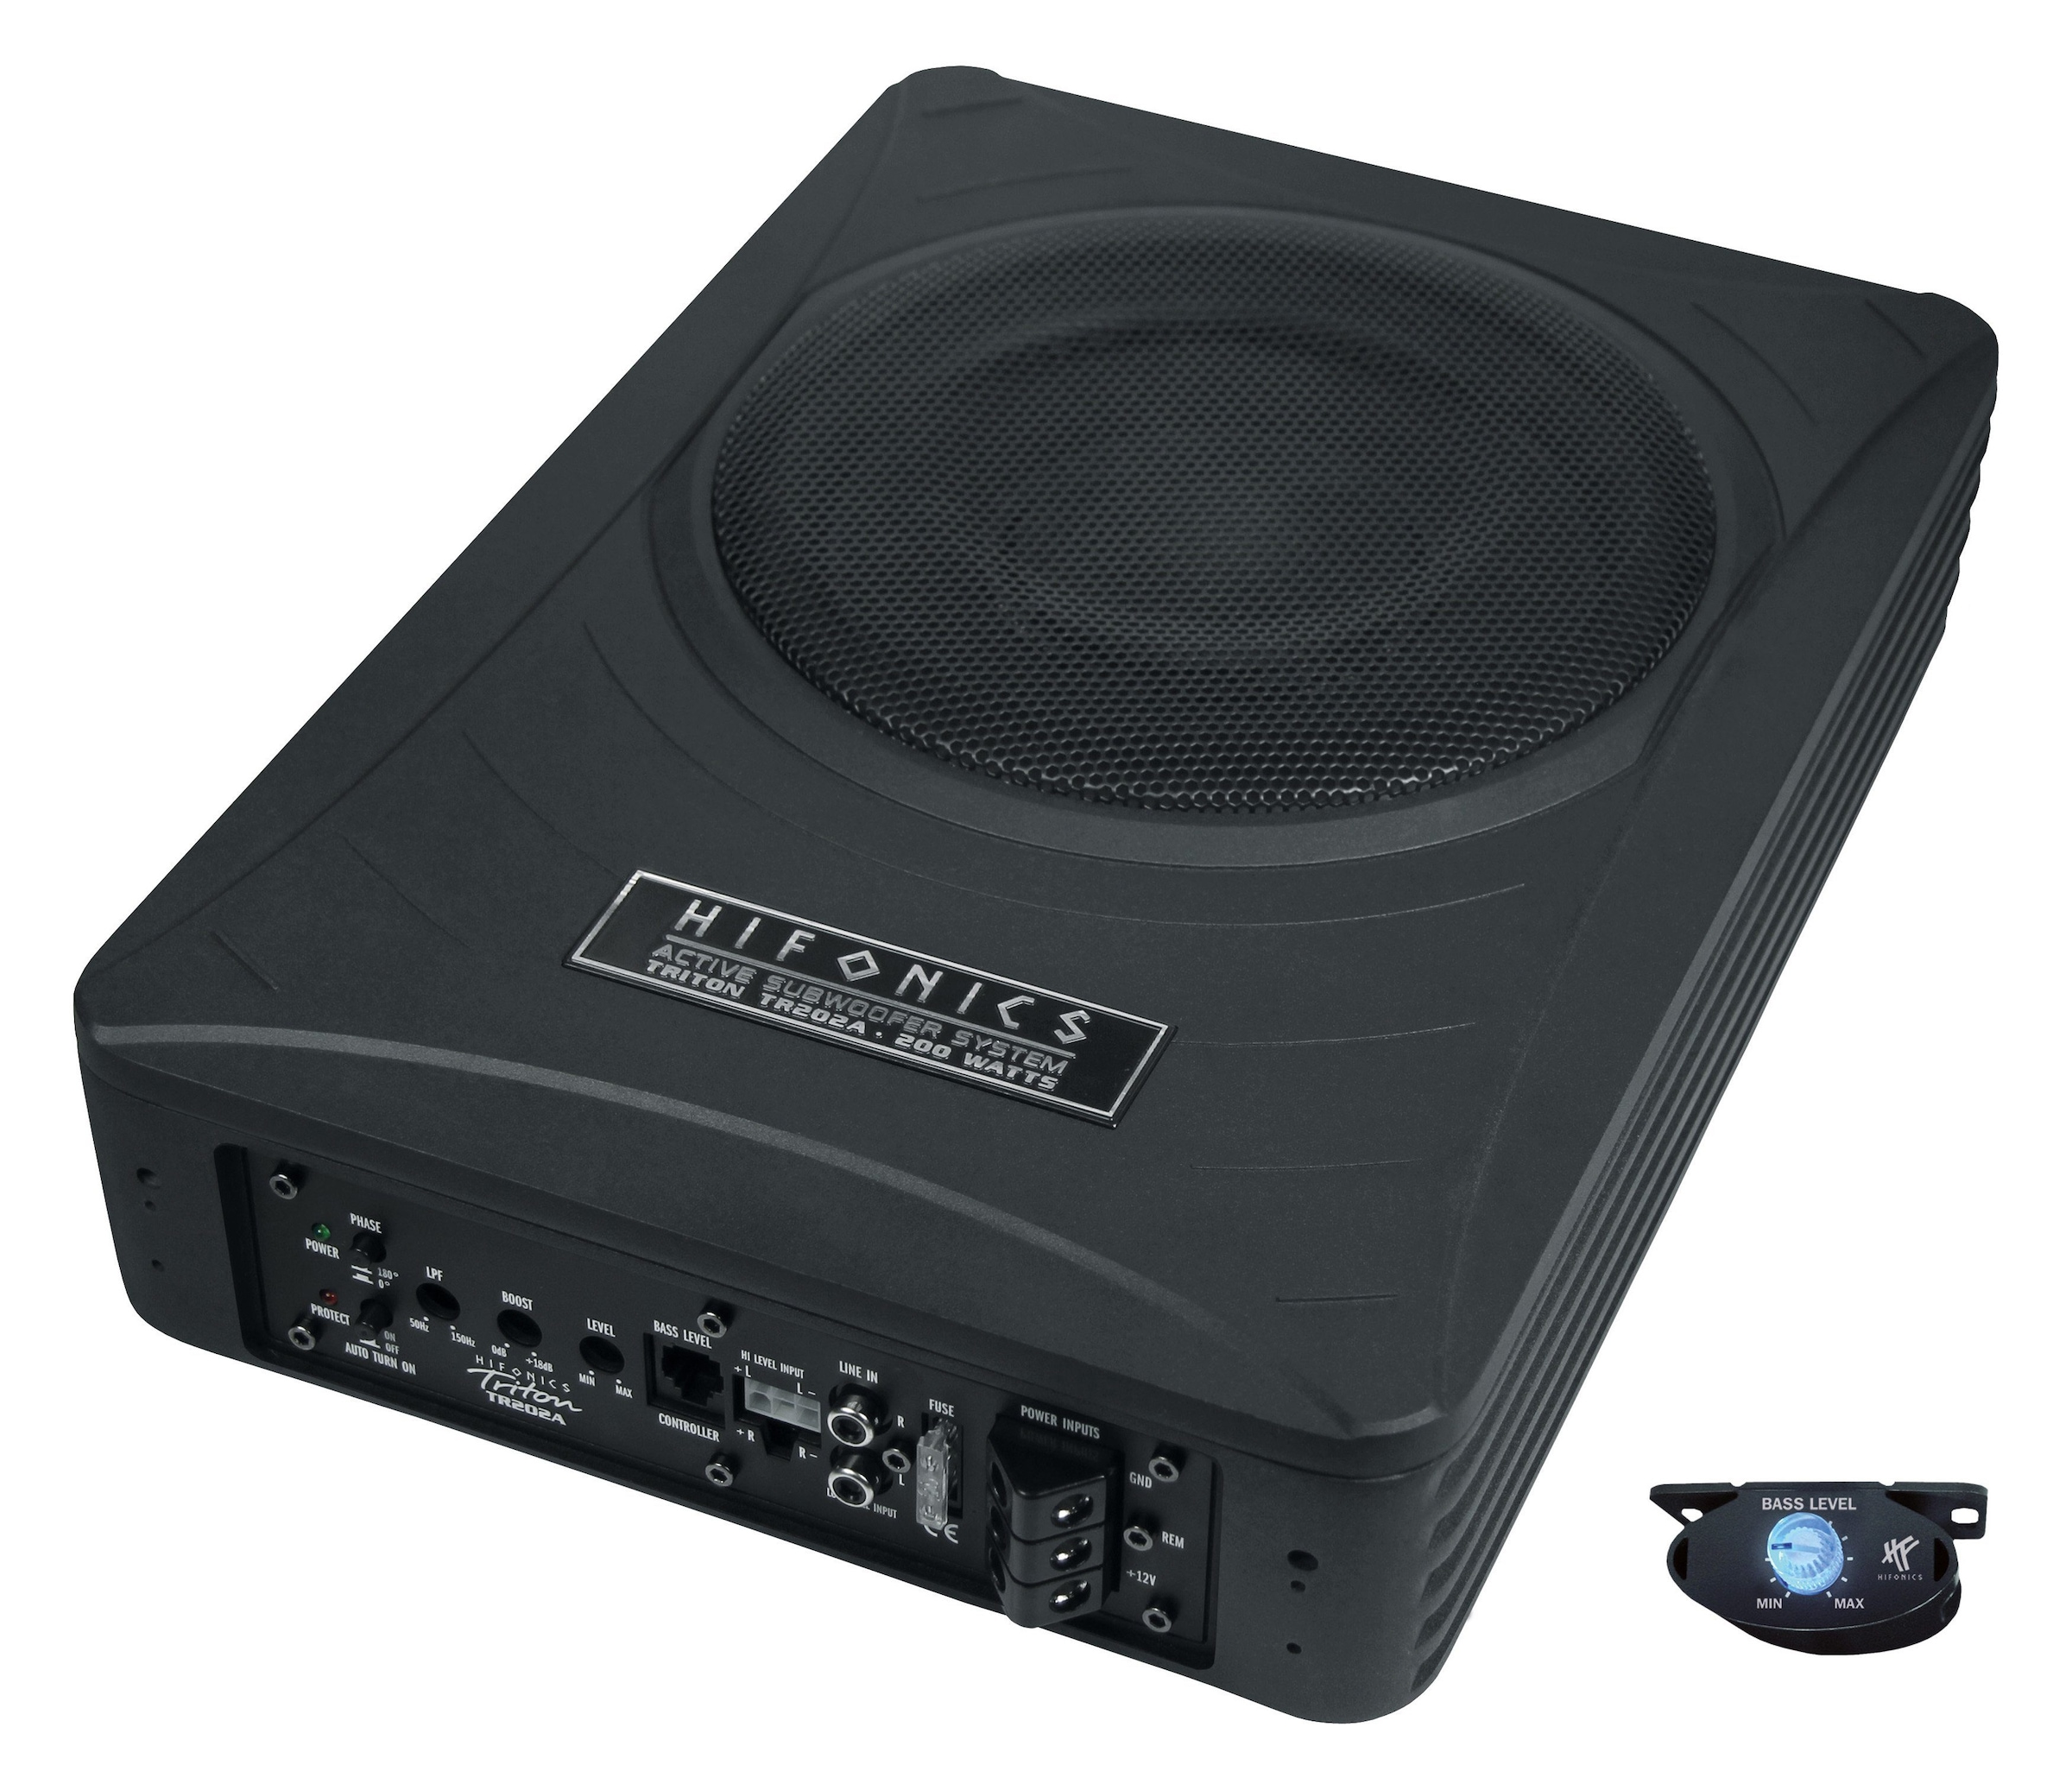 Blaupunkt 20cm GTb-8200A Endstufe Aktivbass 12V Aktivsubwoofer 200W Bassbox PKW